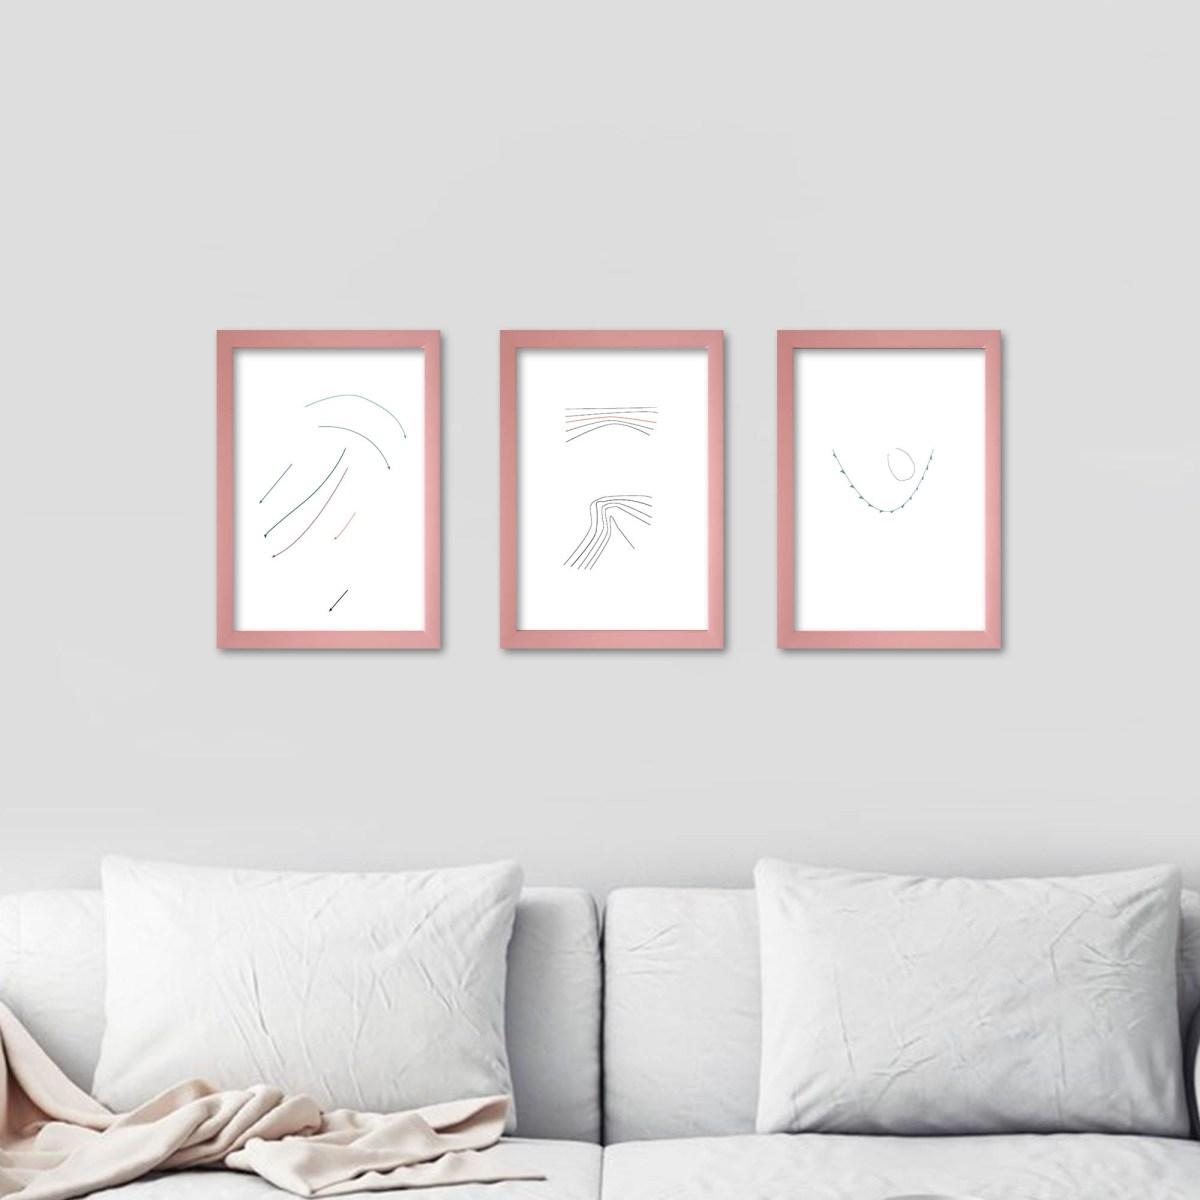 Dibujo digital, las cosas infinitas #2 de Fernanda Barreto en living